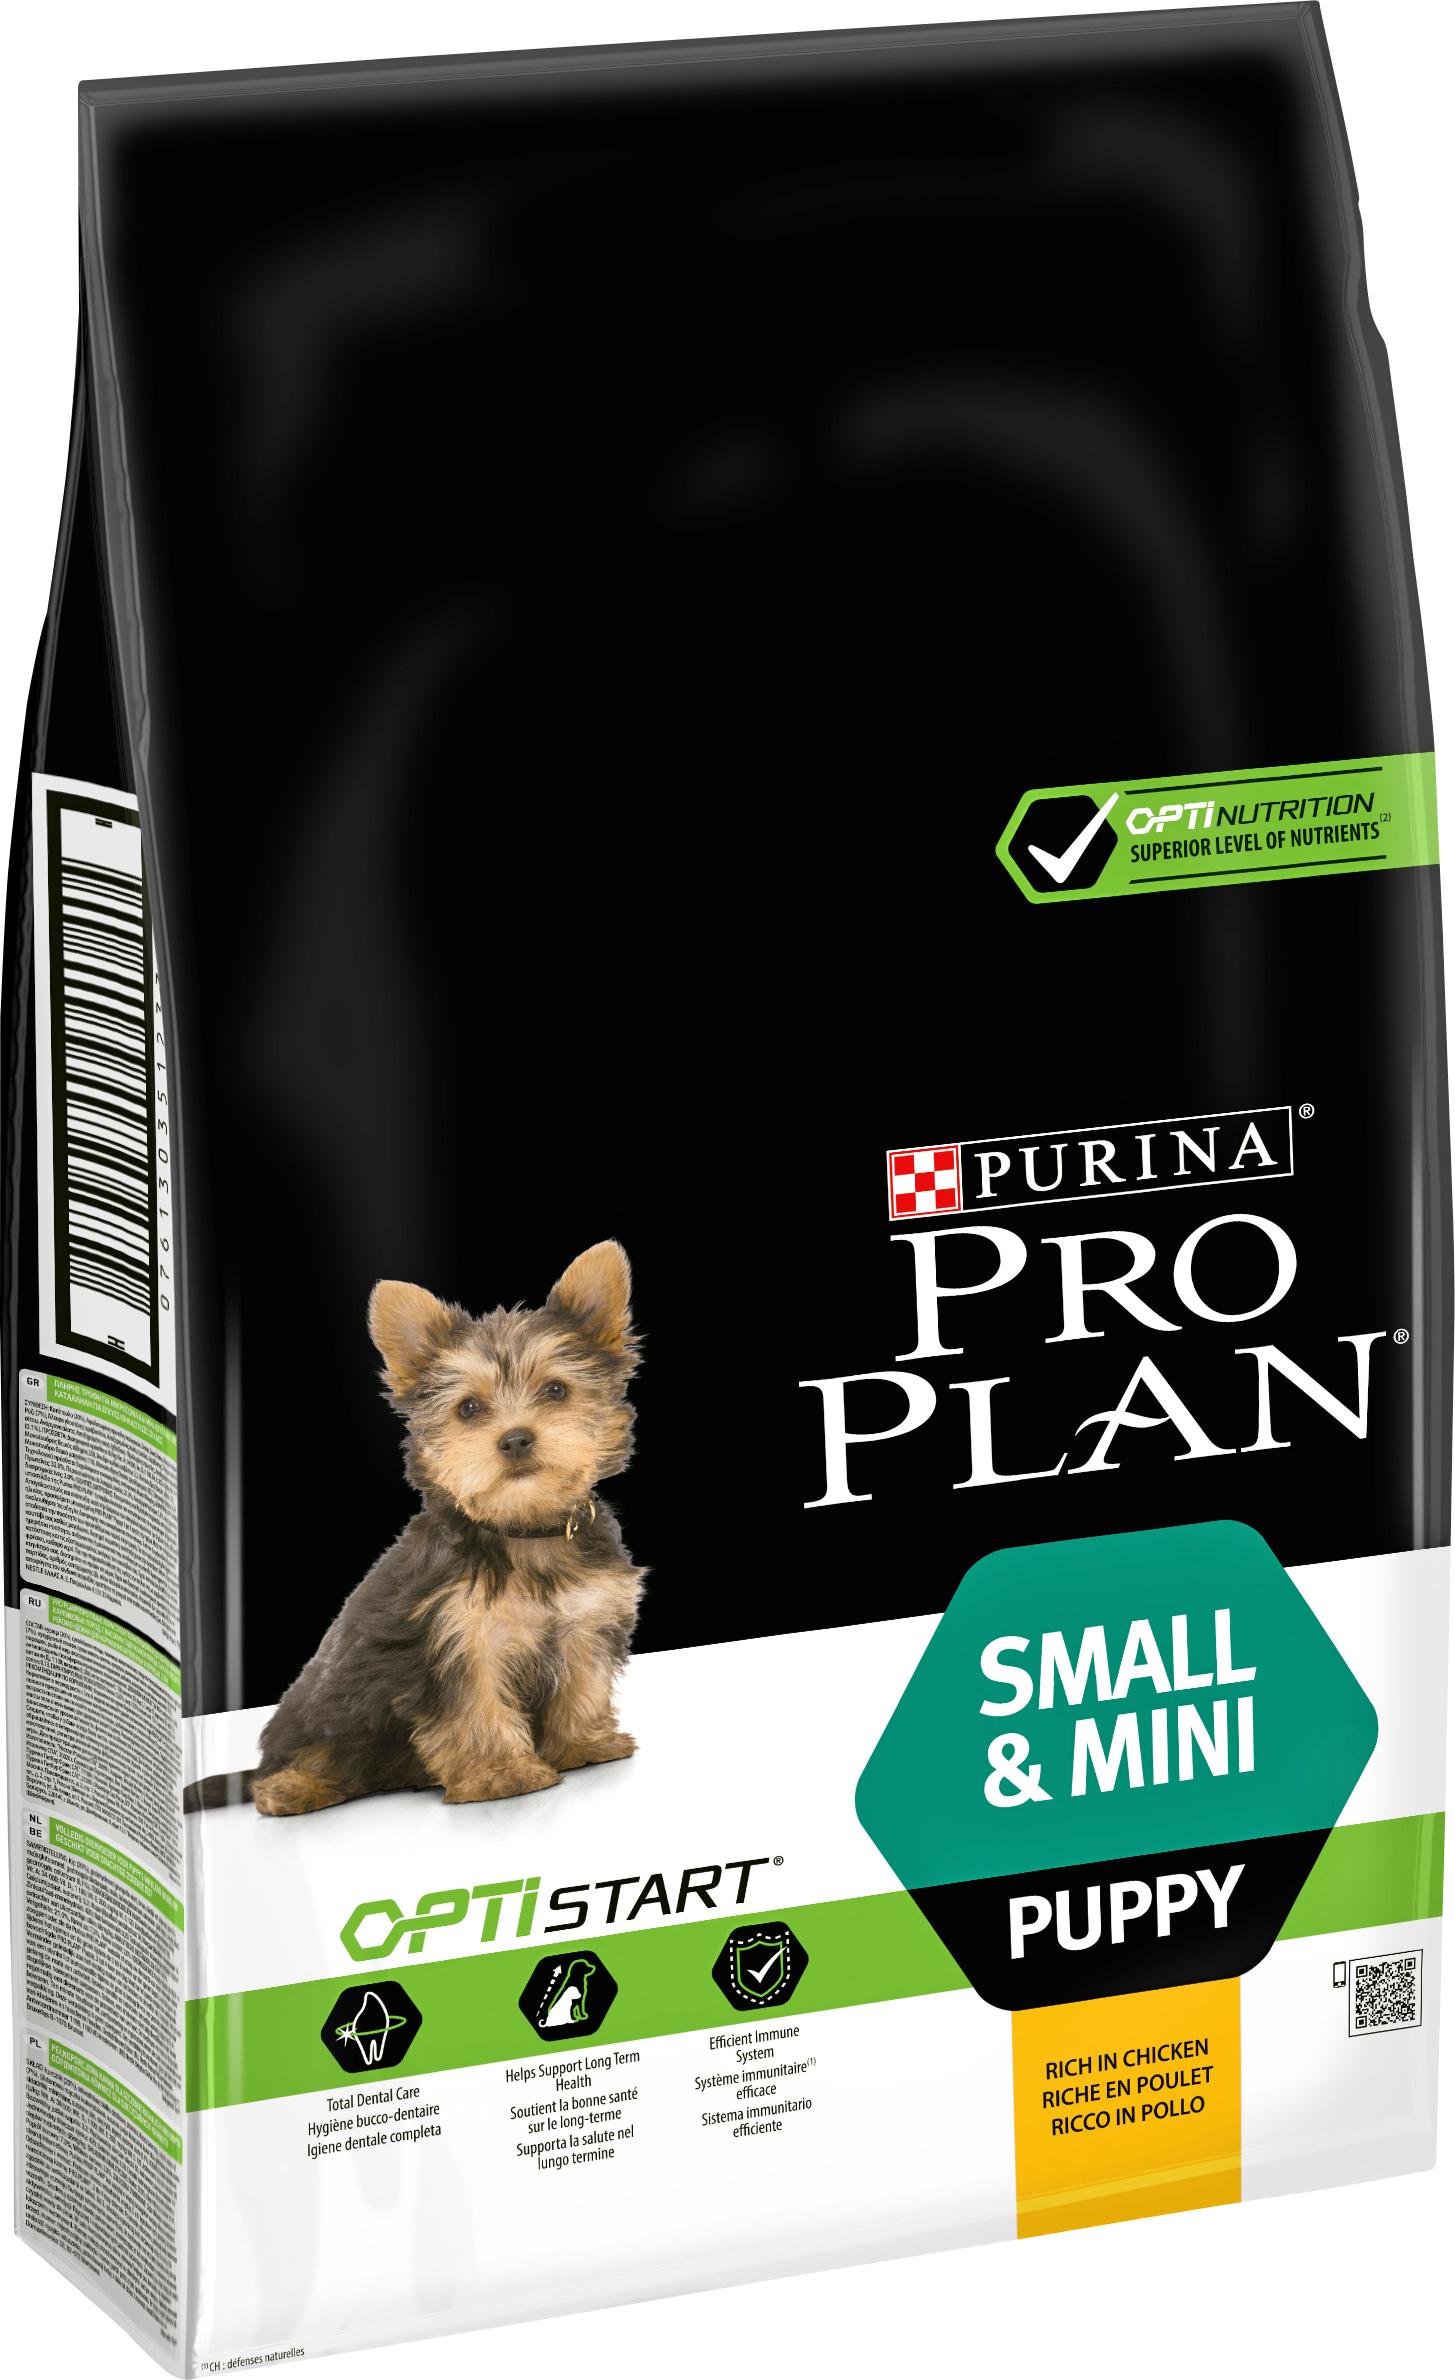 Hundfoder Pro Plan Small & Mini Puppy, 7 kg